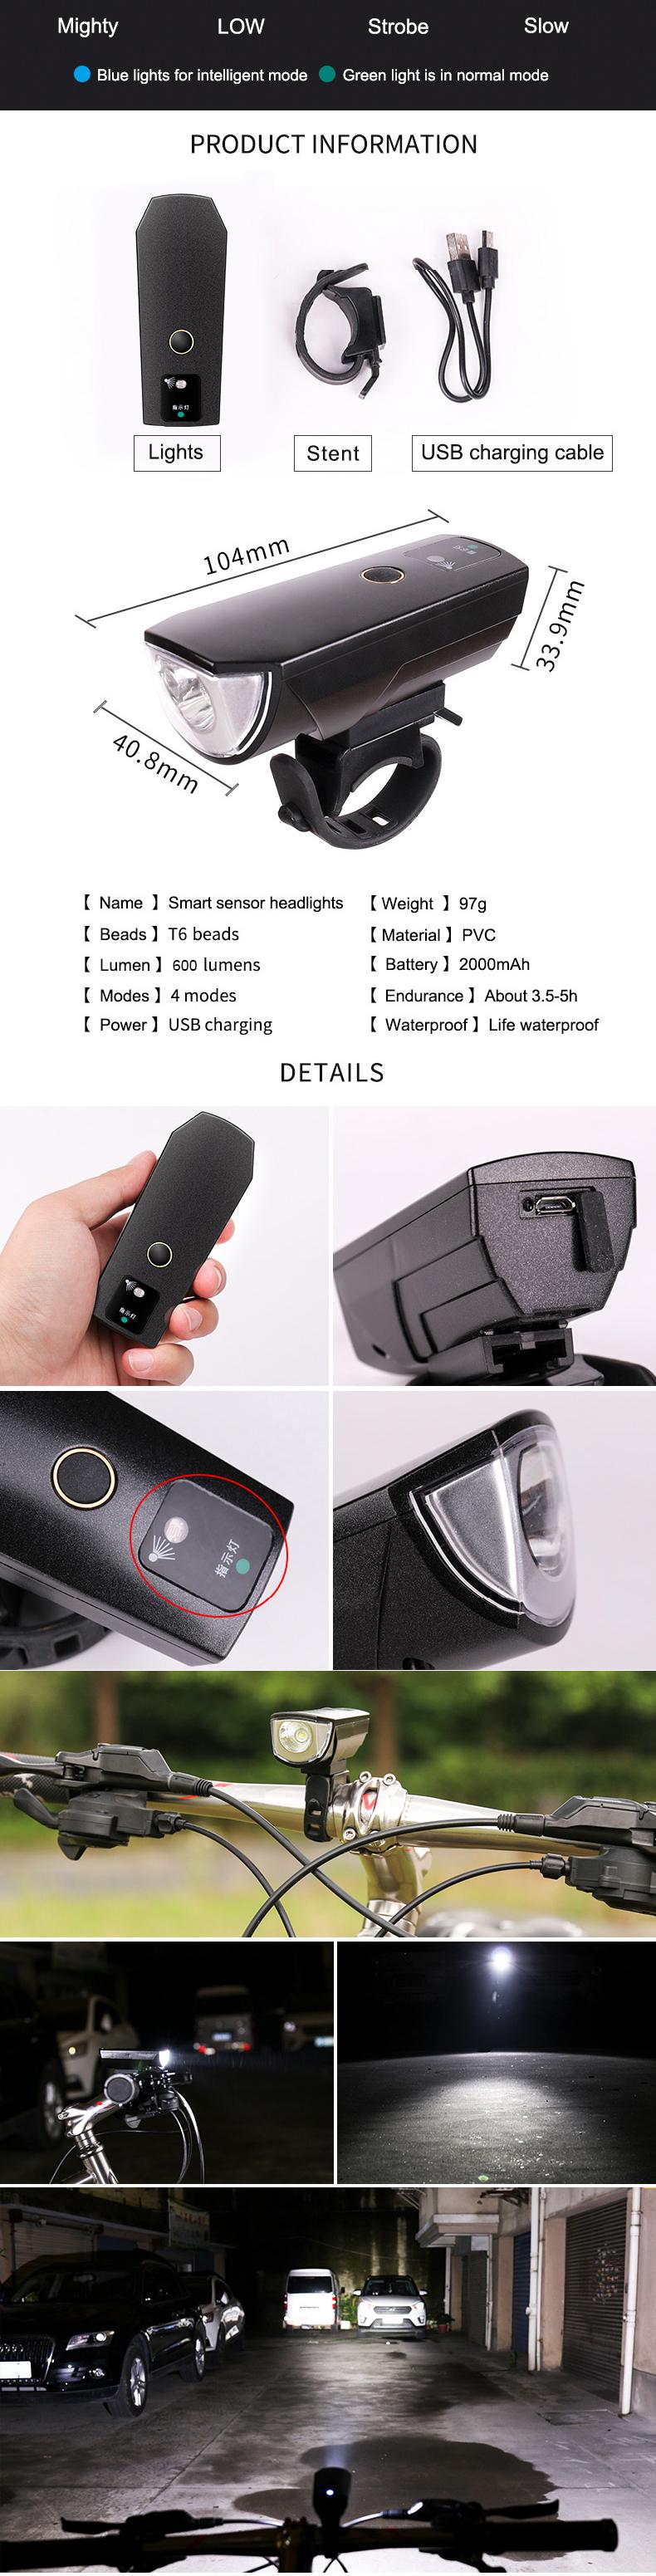 XANESКомплектдлявелосипедаLightSFL02 600LM T6 Смарт-индукционный передний свет STL02 Смартфон USB-перезаряжаемый - фото 3